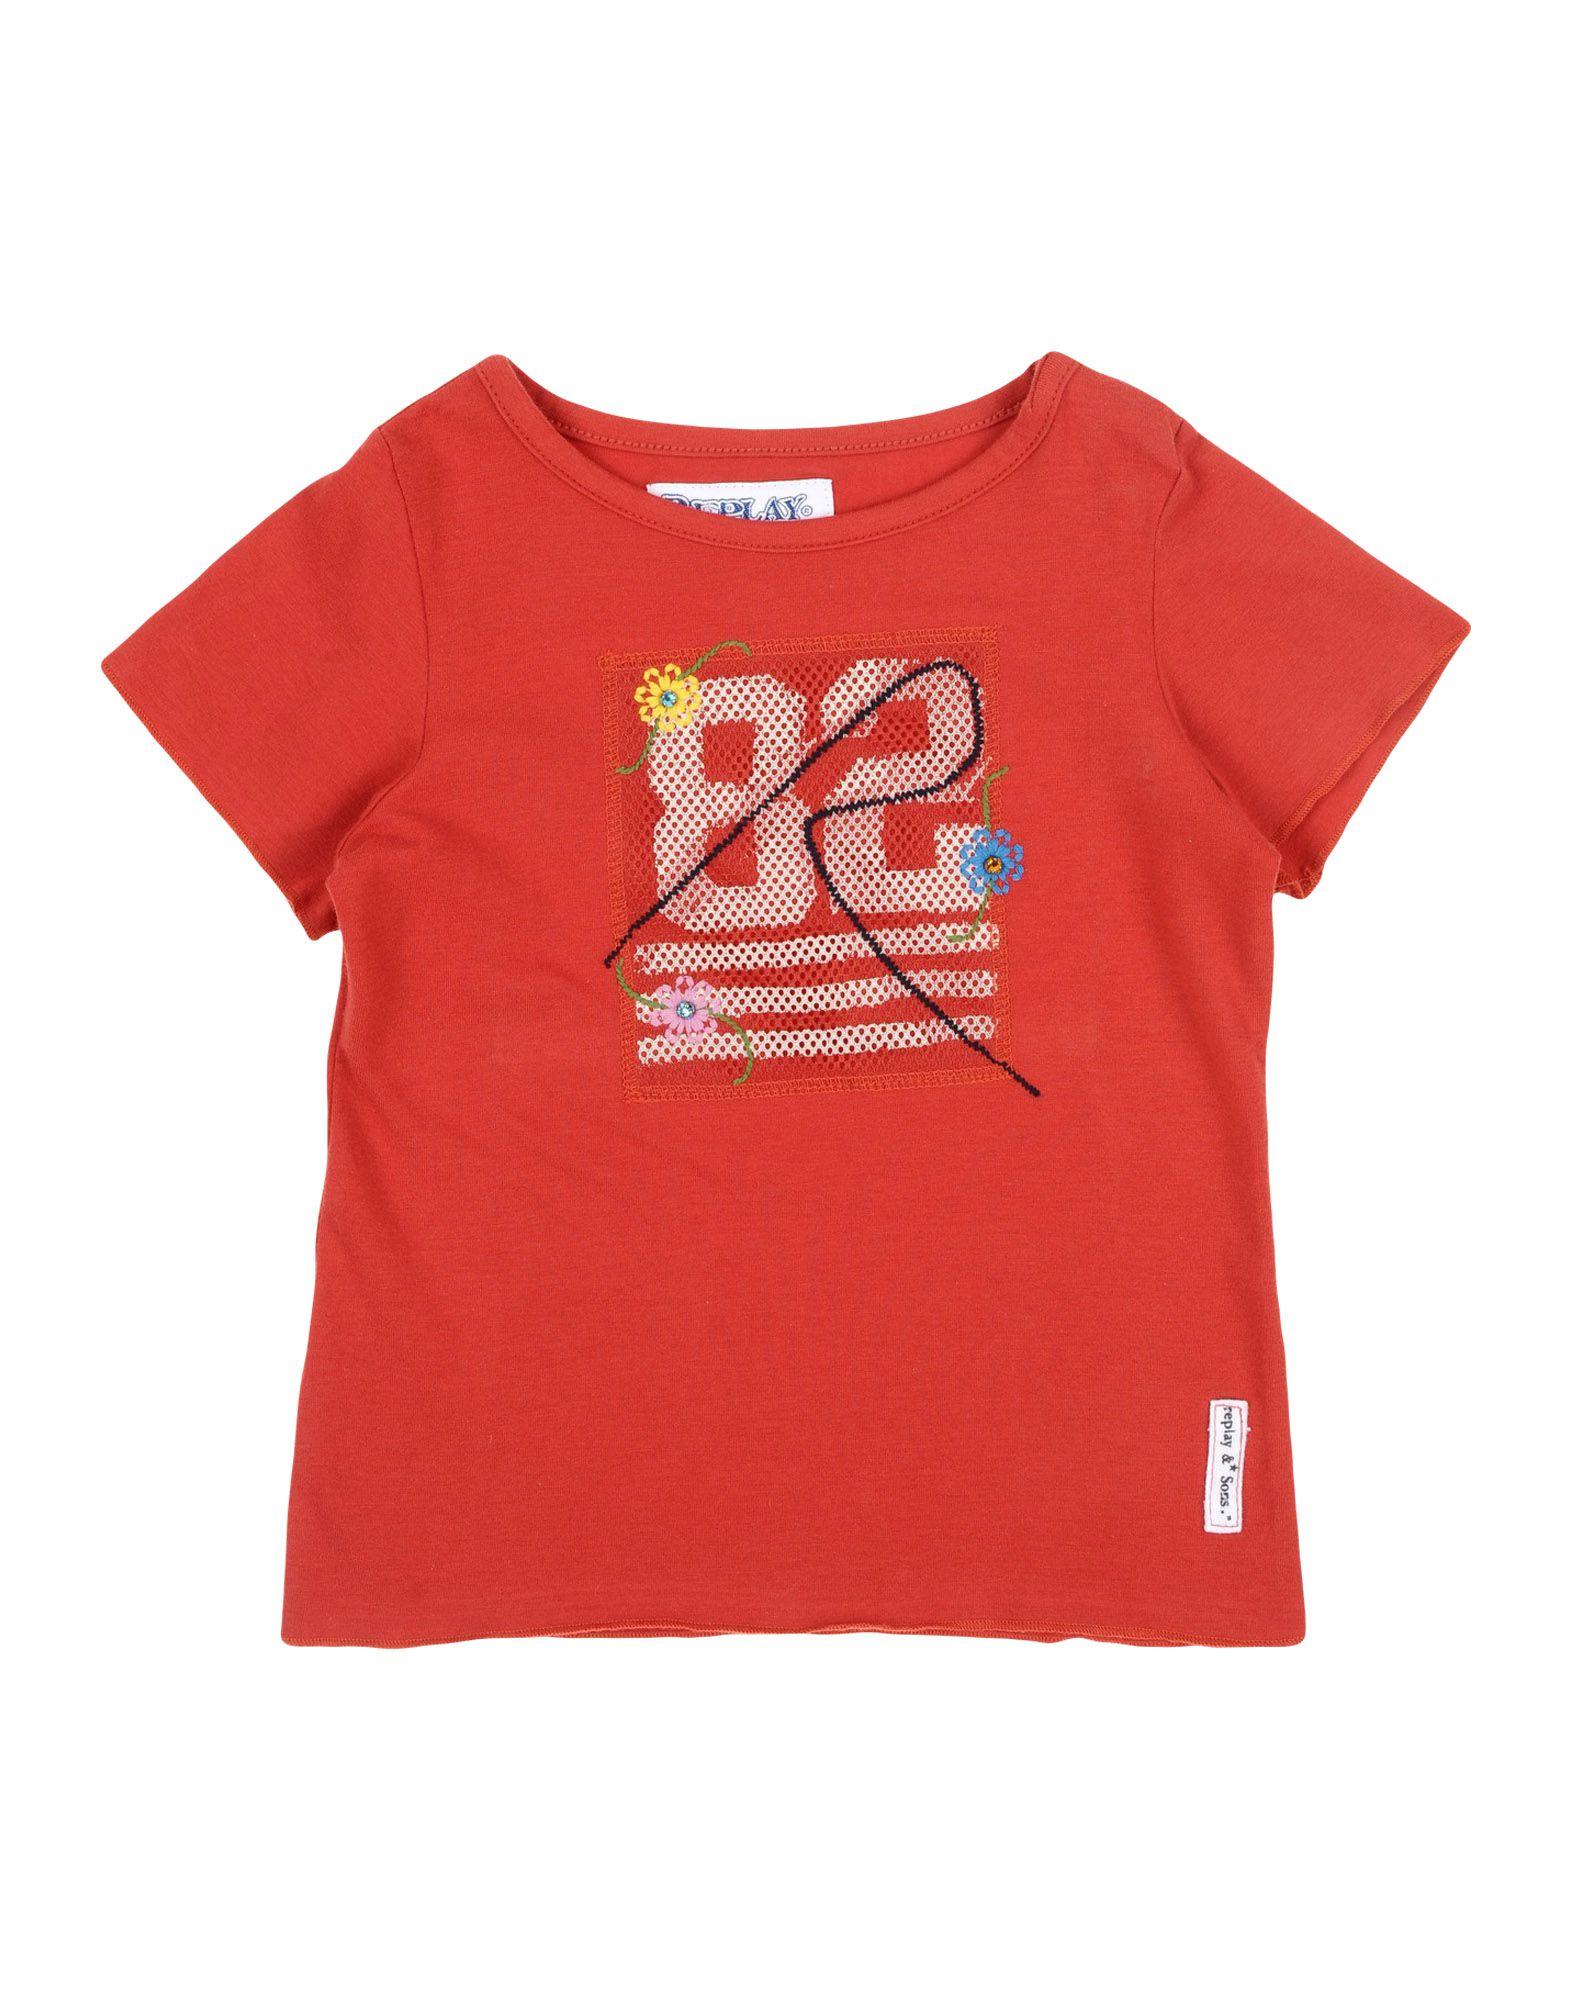 REPLAY & SONS BABY Футболка футболка replay 121xw3291 xw3291